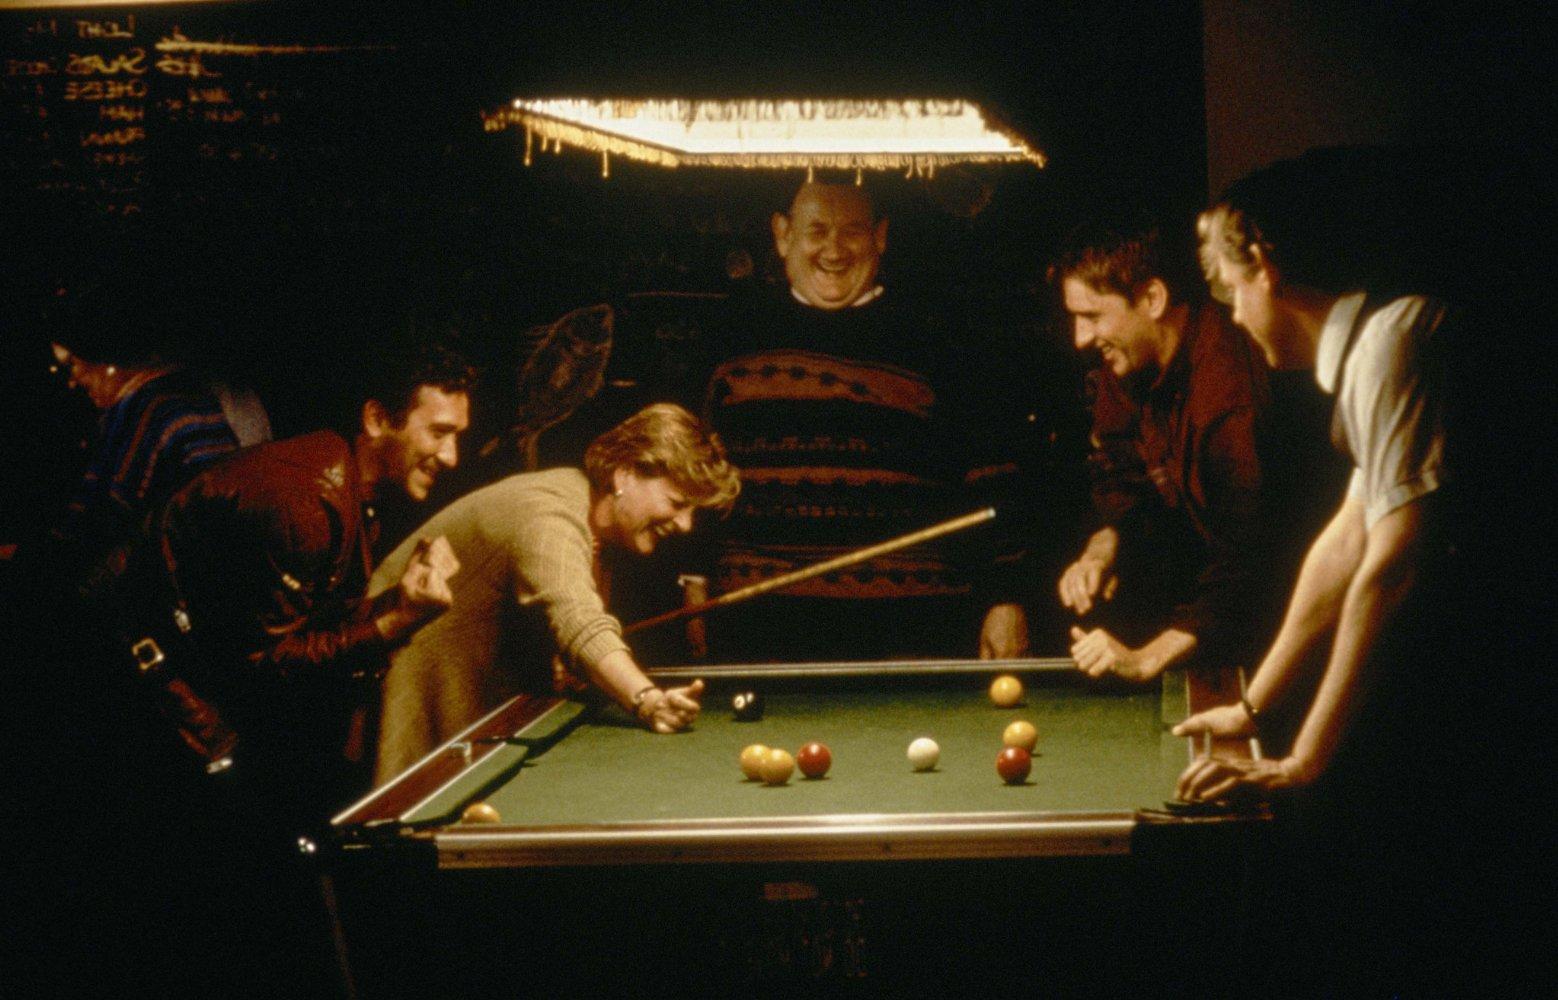 123movies - Craig Ferguson movies list